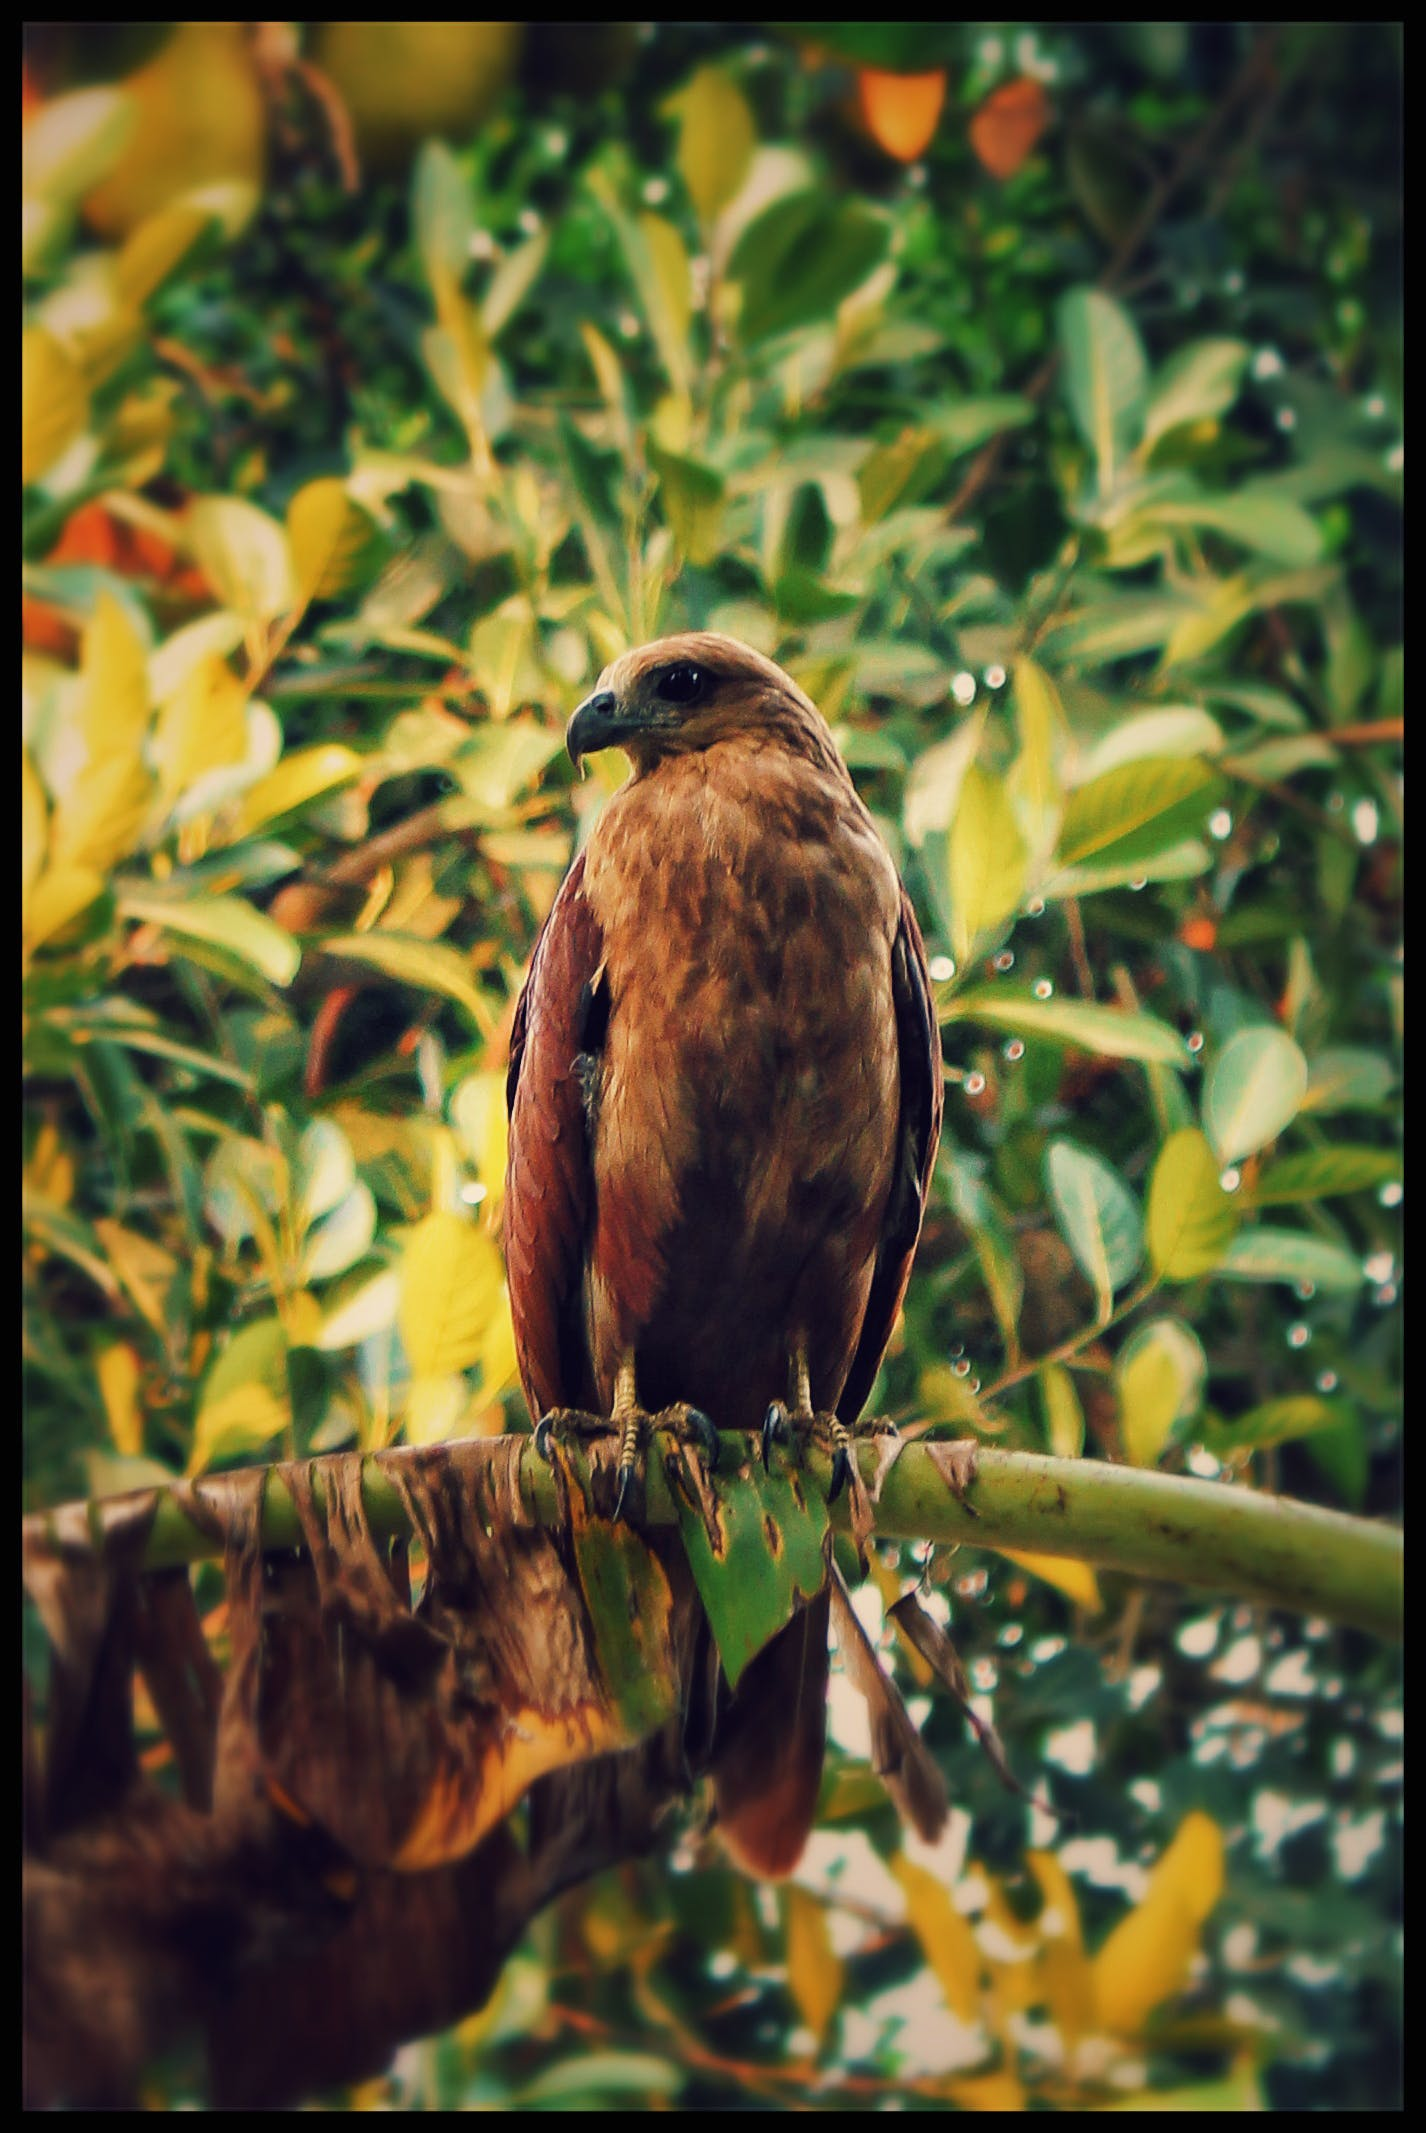 Free stock photo of nature, bird, photography, bald eagle